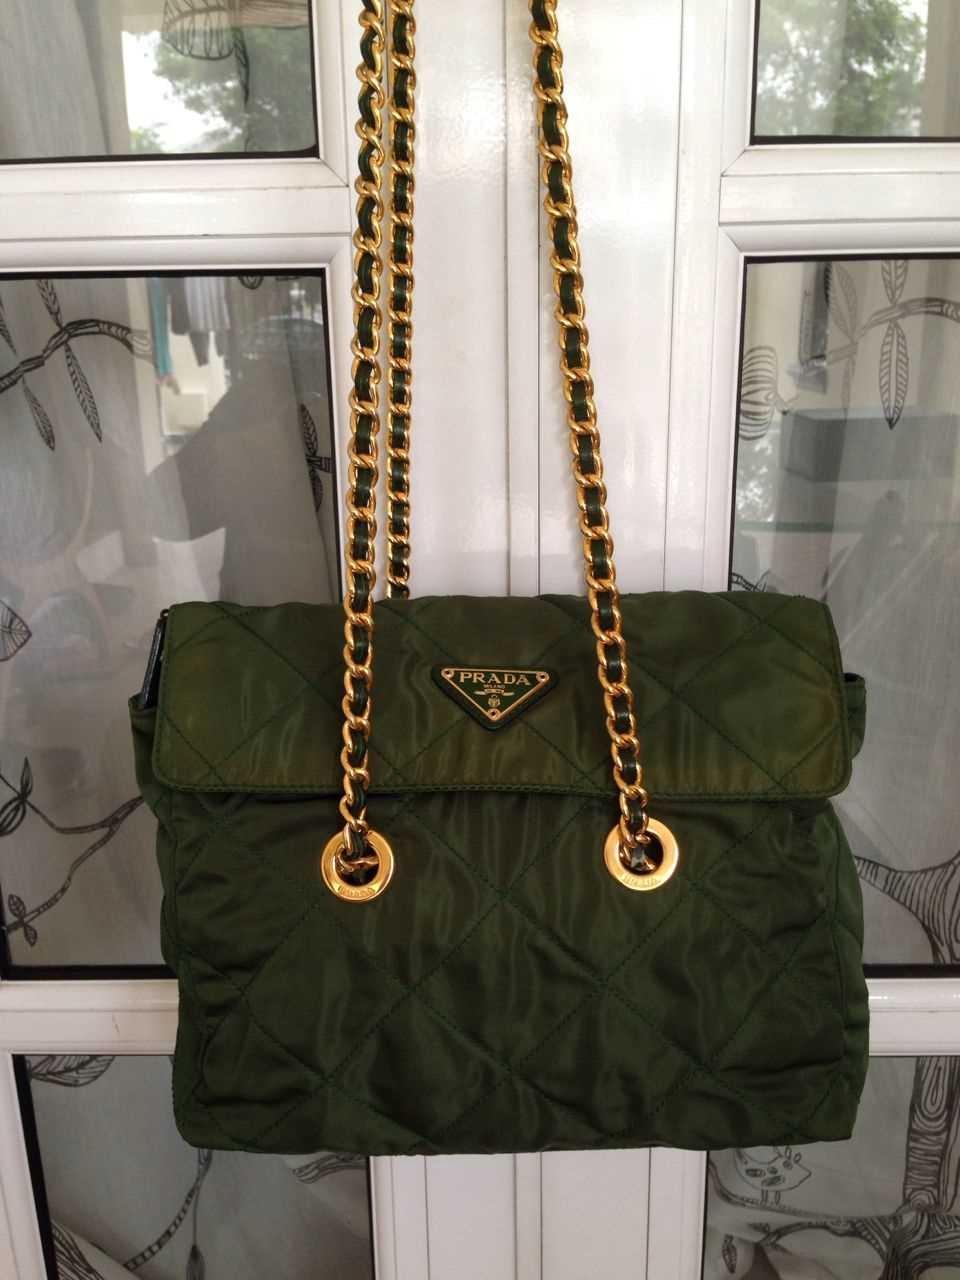 101445ed4d38 ... official authentic prada quilted green nylon chain bag 5ffad a8538  germany prada tessuto impuntu quilted nylon shoulder chain handbag bl0910  black ...